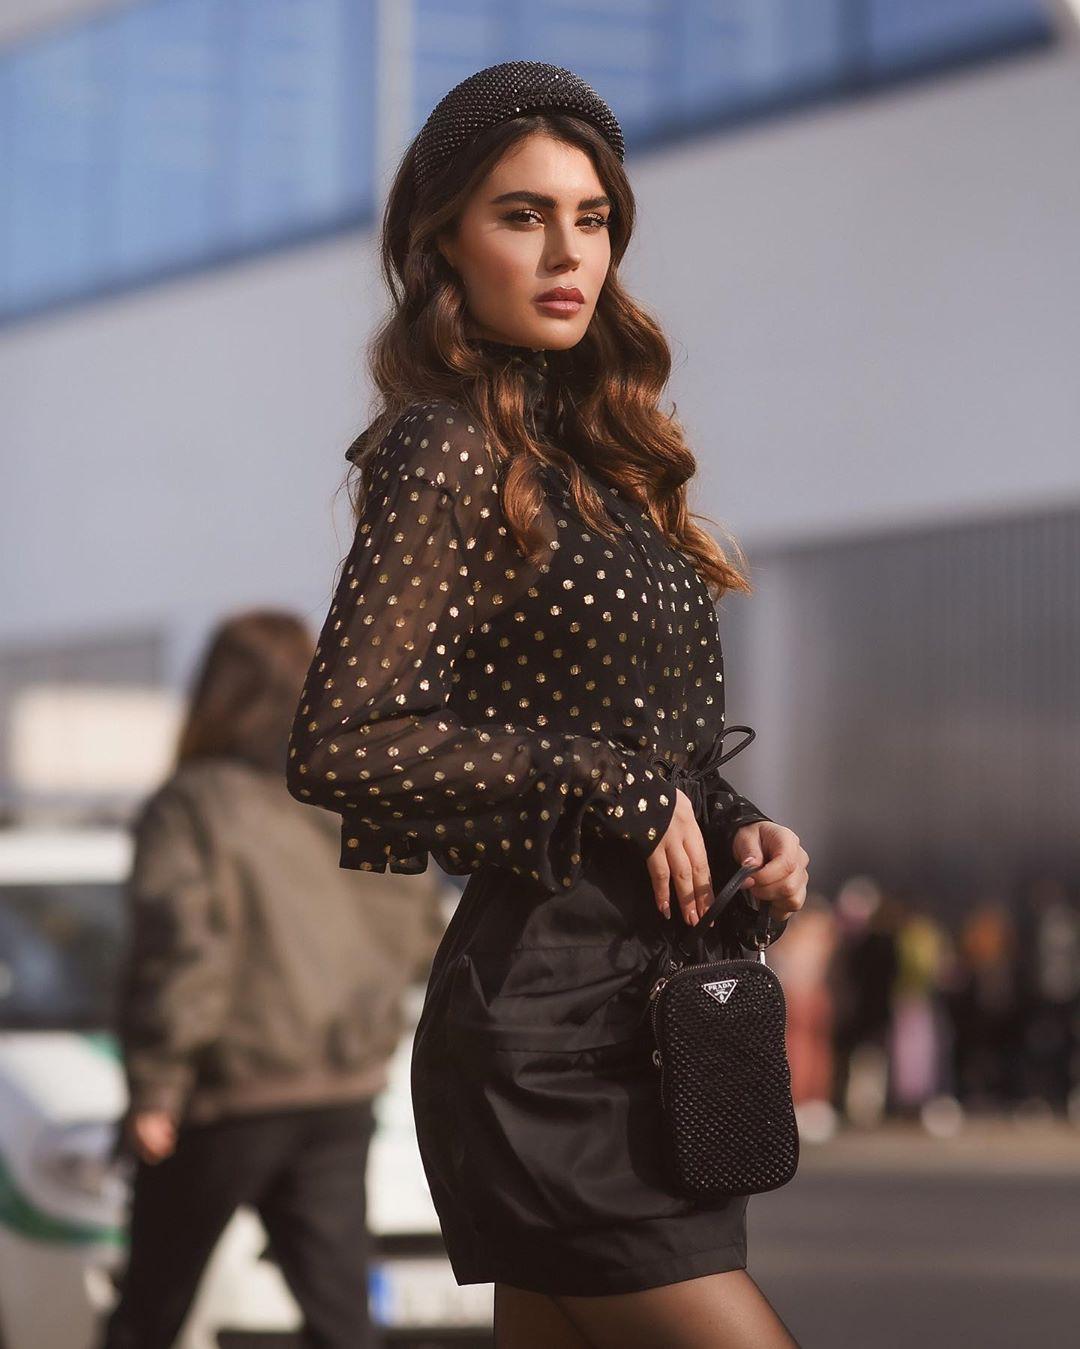 Silvia Caruso dresses ideas, Hot Model Wallpaper, apparel ideas